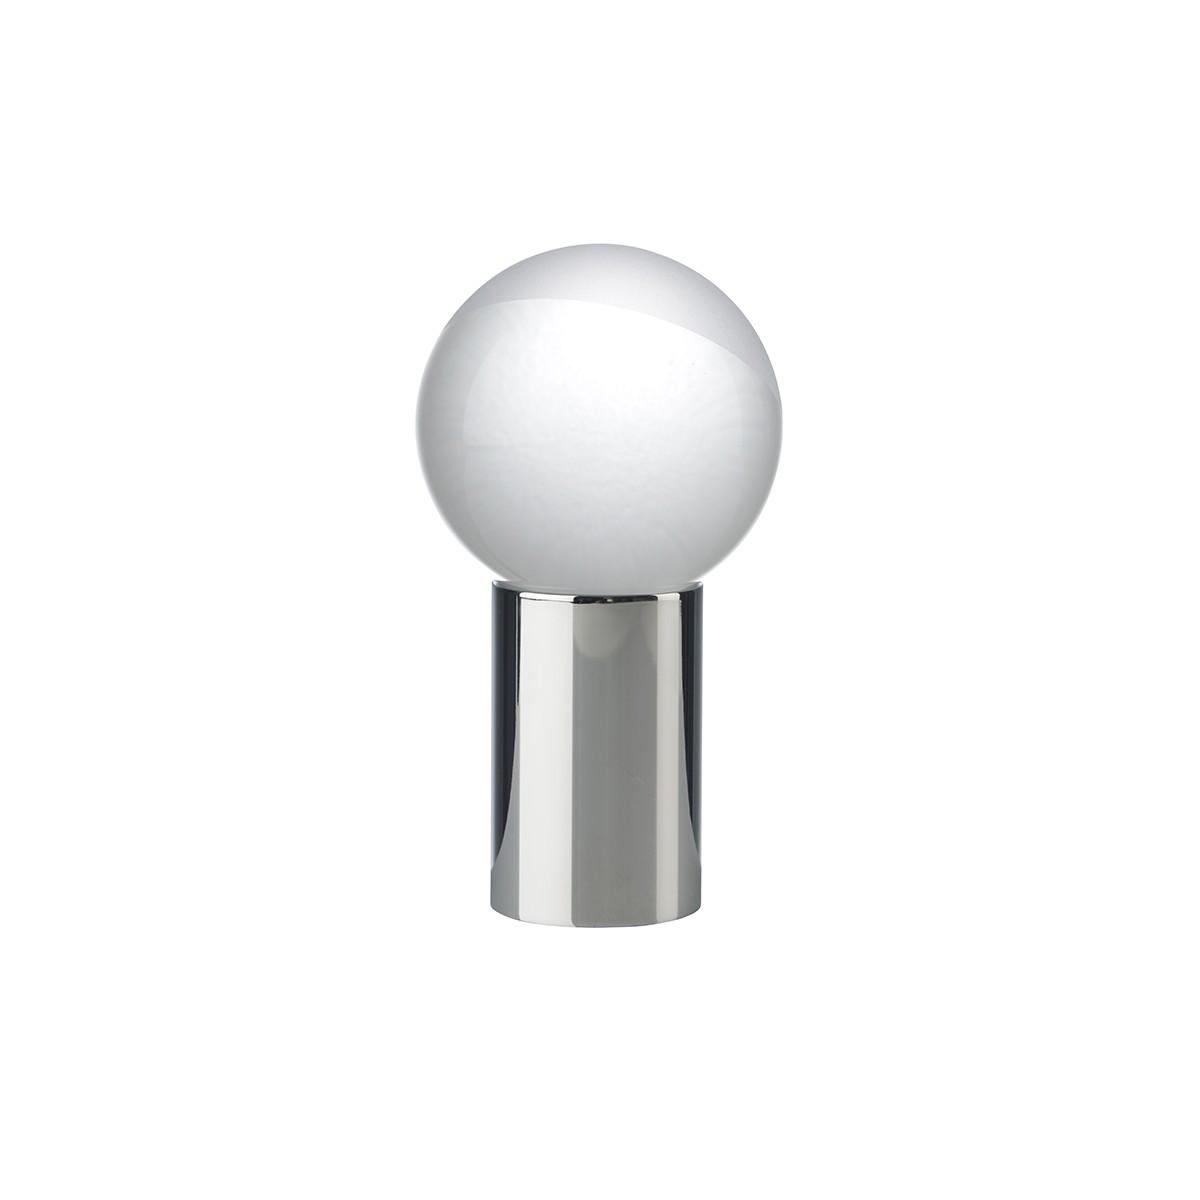 Sompex Contro LED Tischleuchte, Chrom